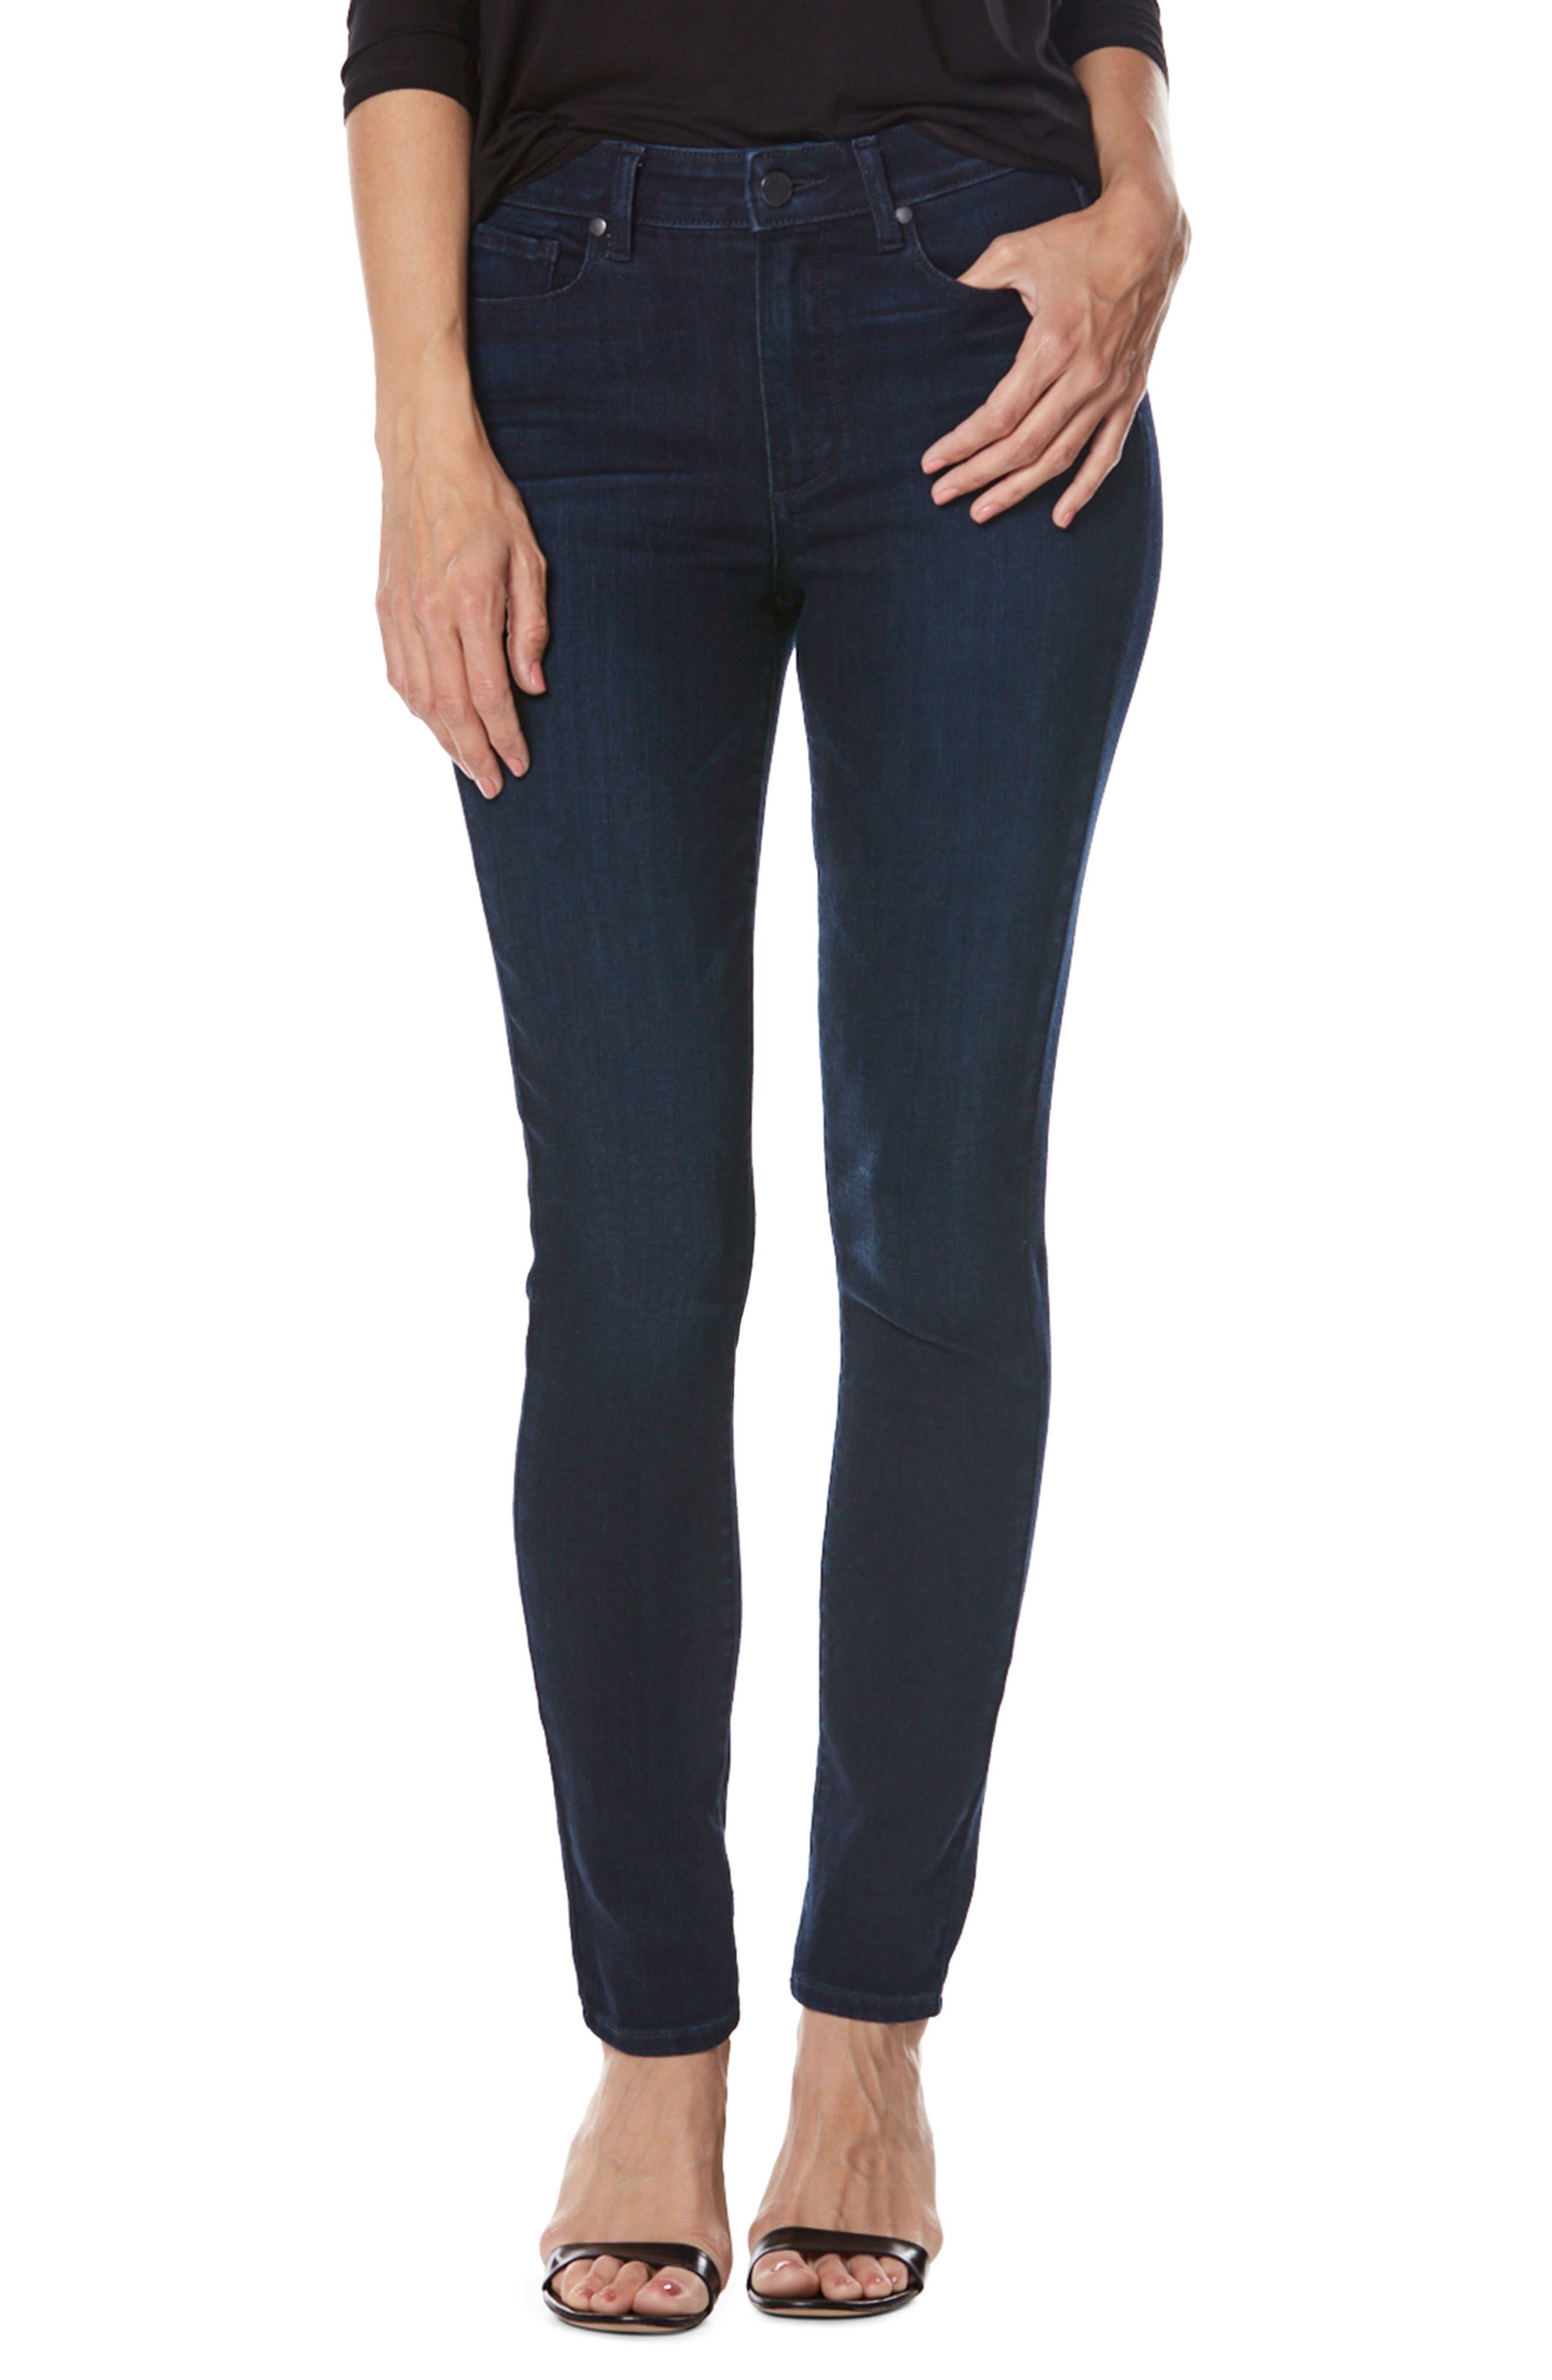 Transcend - Hoxton High Waist Ultra Skinny Jeans,                         Main,                         color, Surge